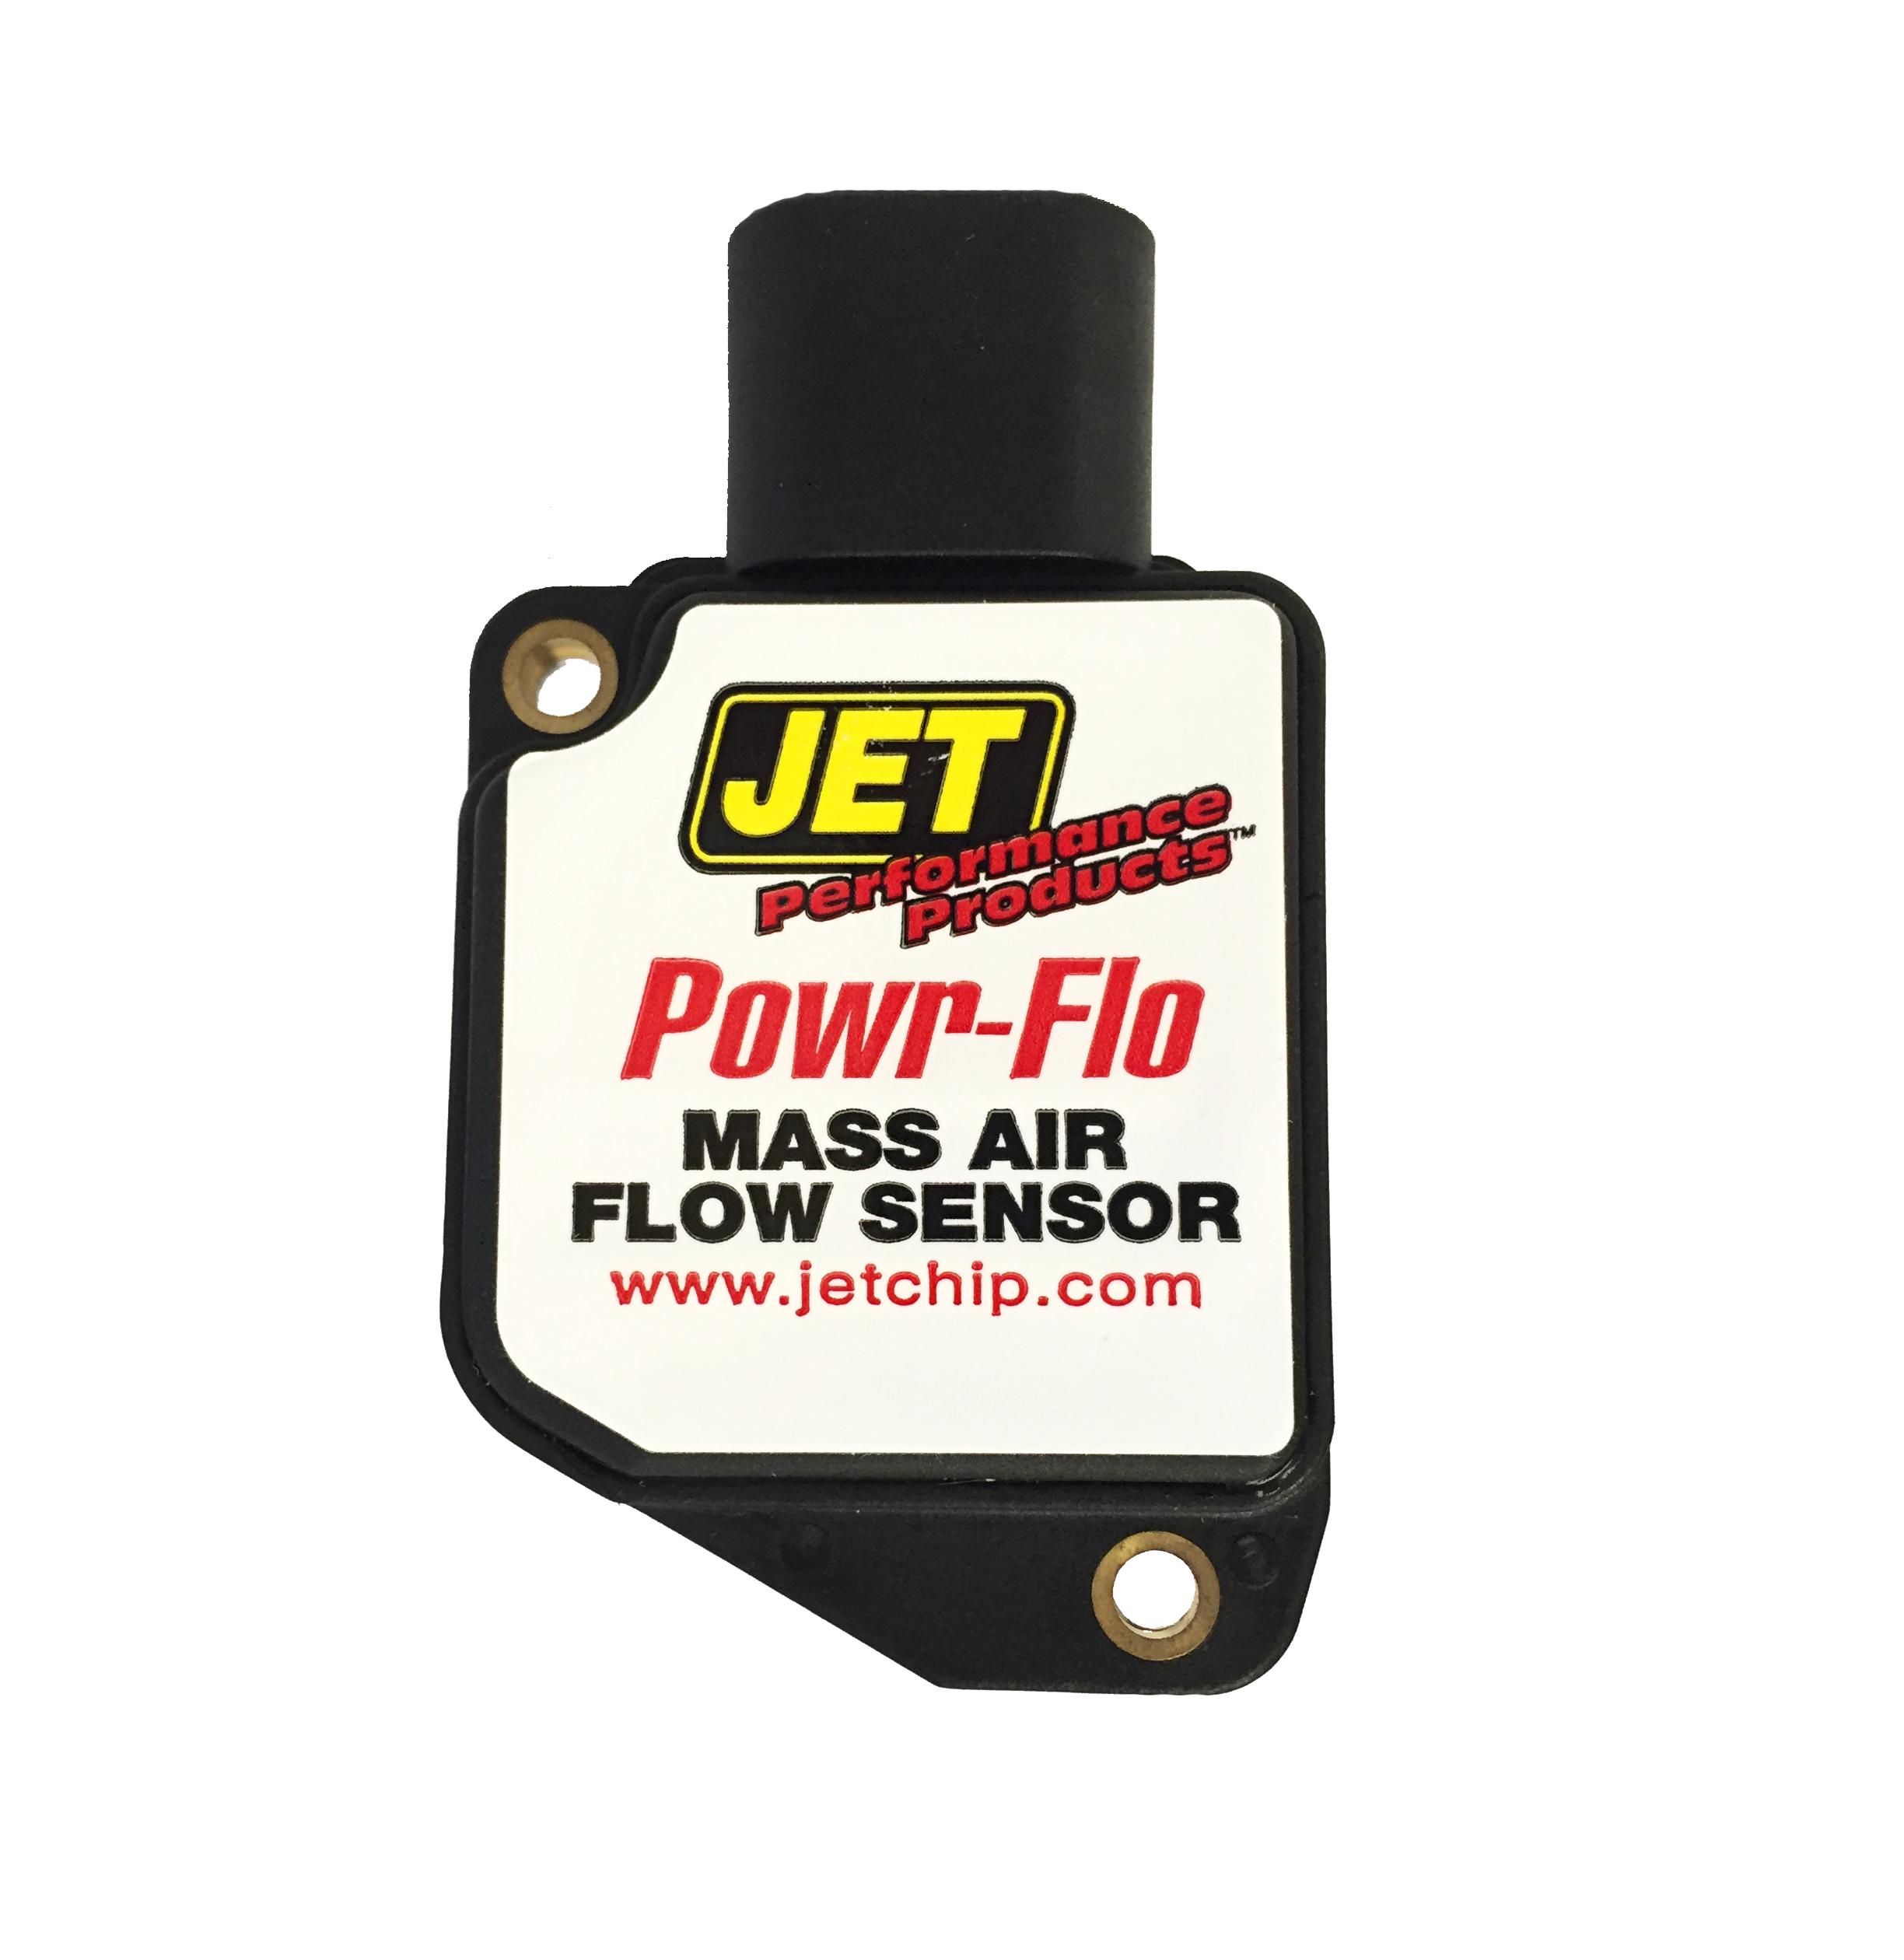 Powr Flo Mass Air Sensor – Jet Performance Products